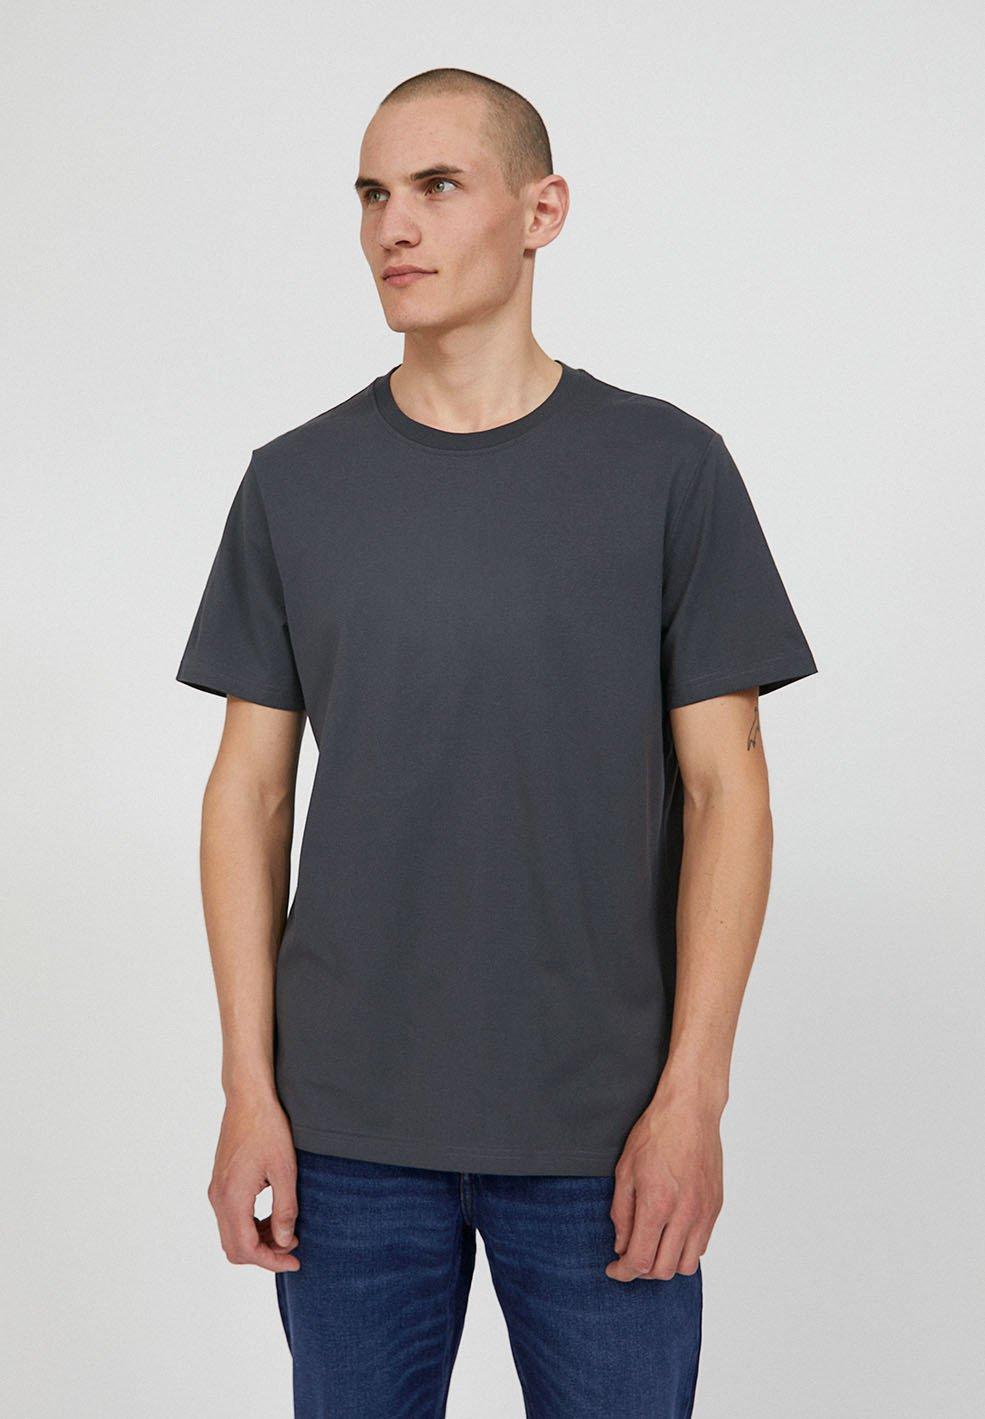 Homme AADO - T-shirt basique